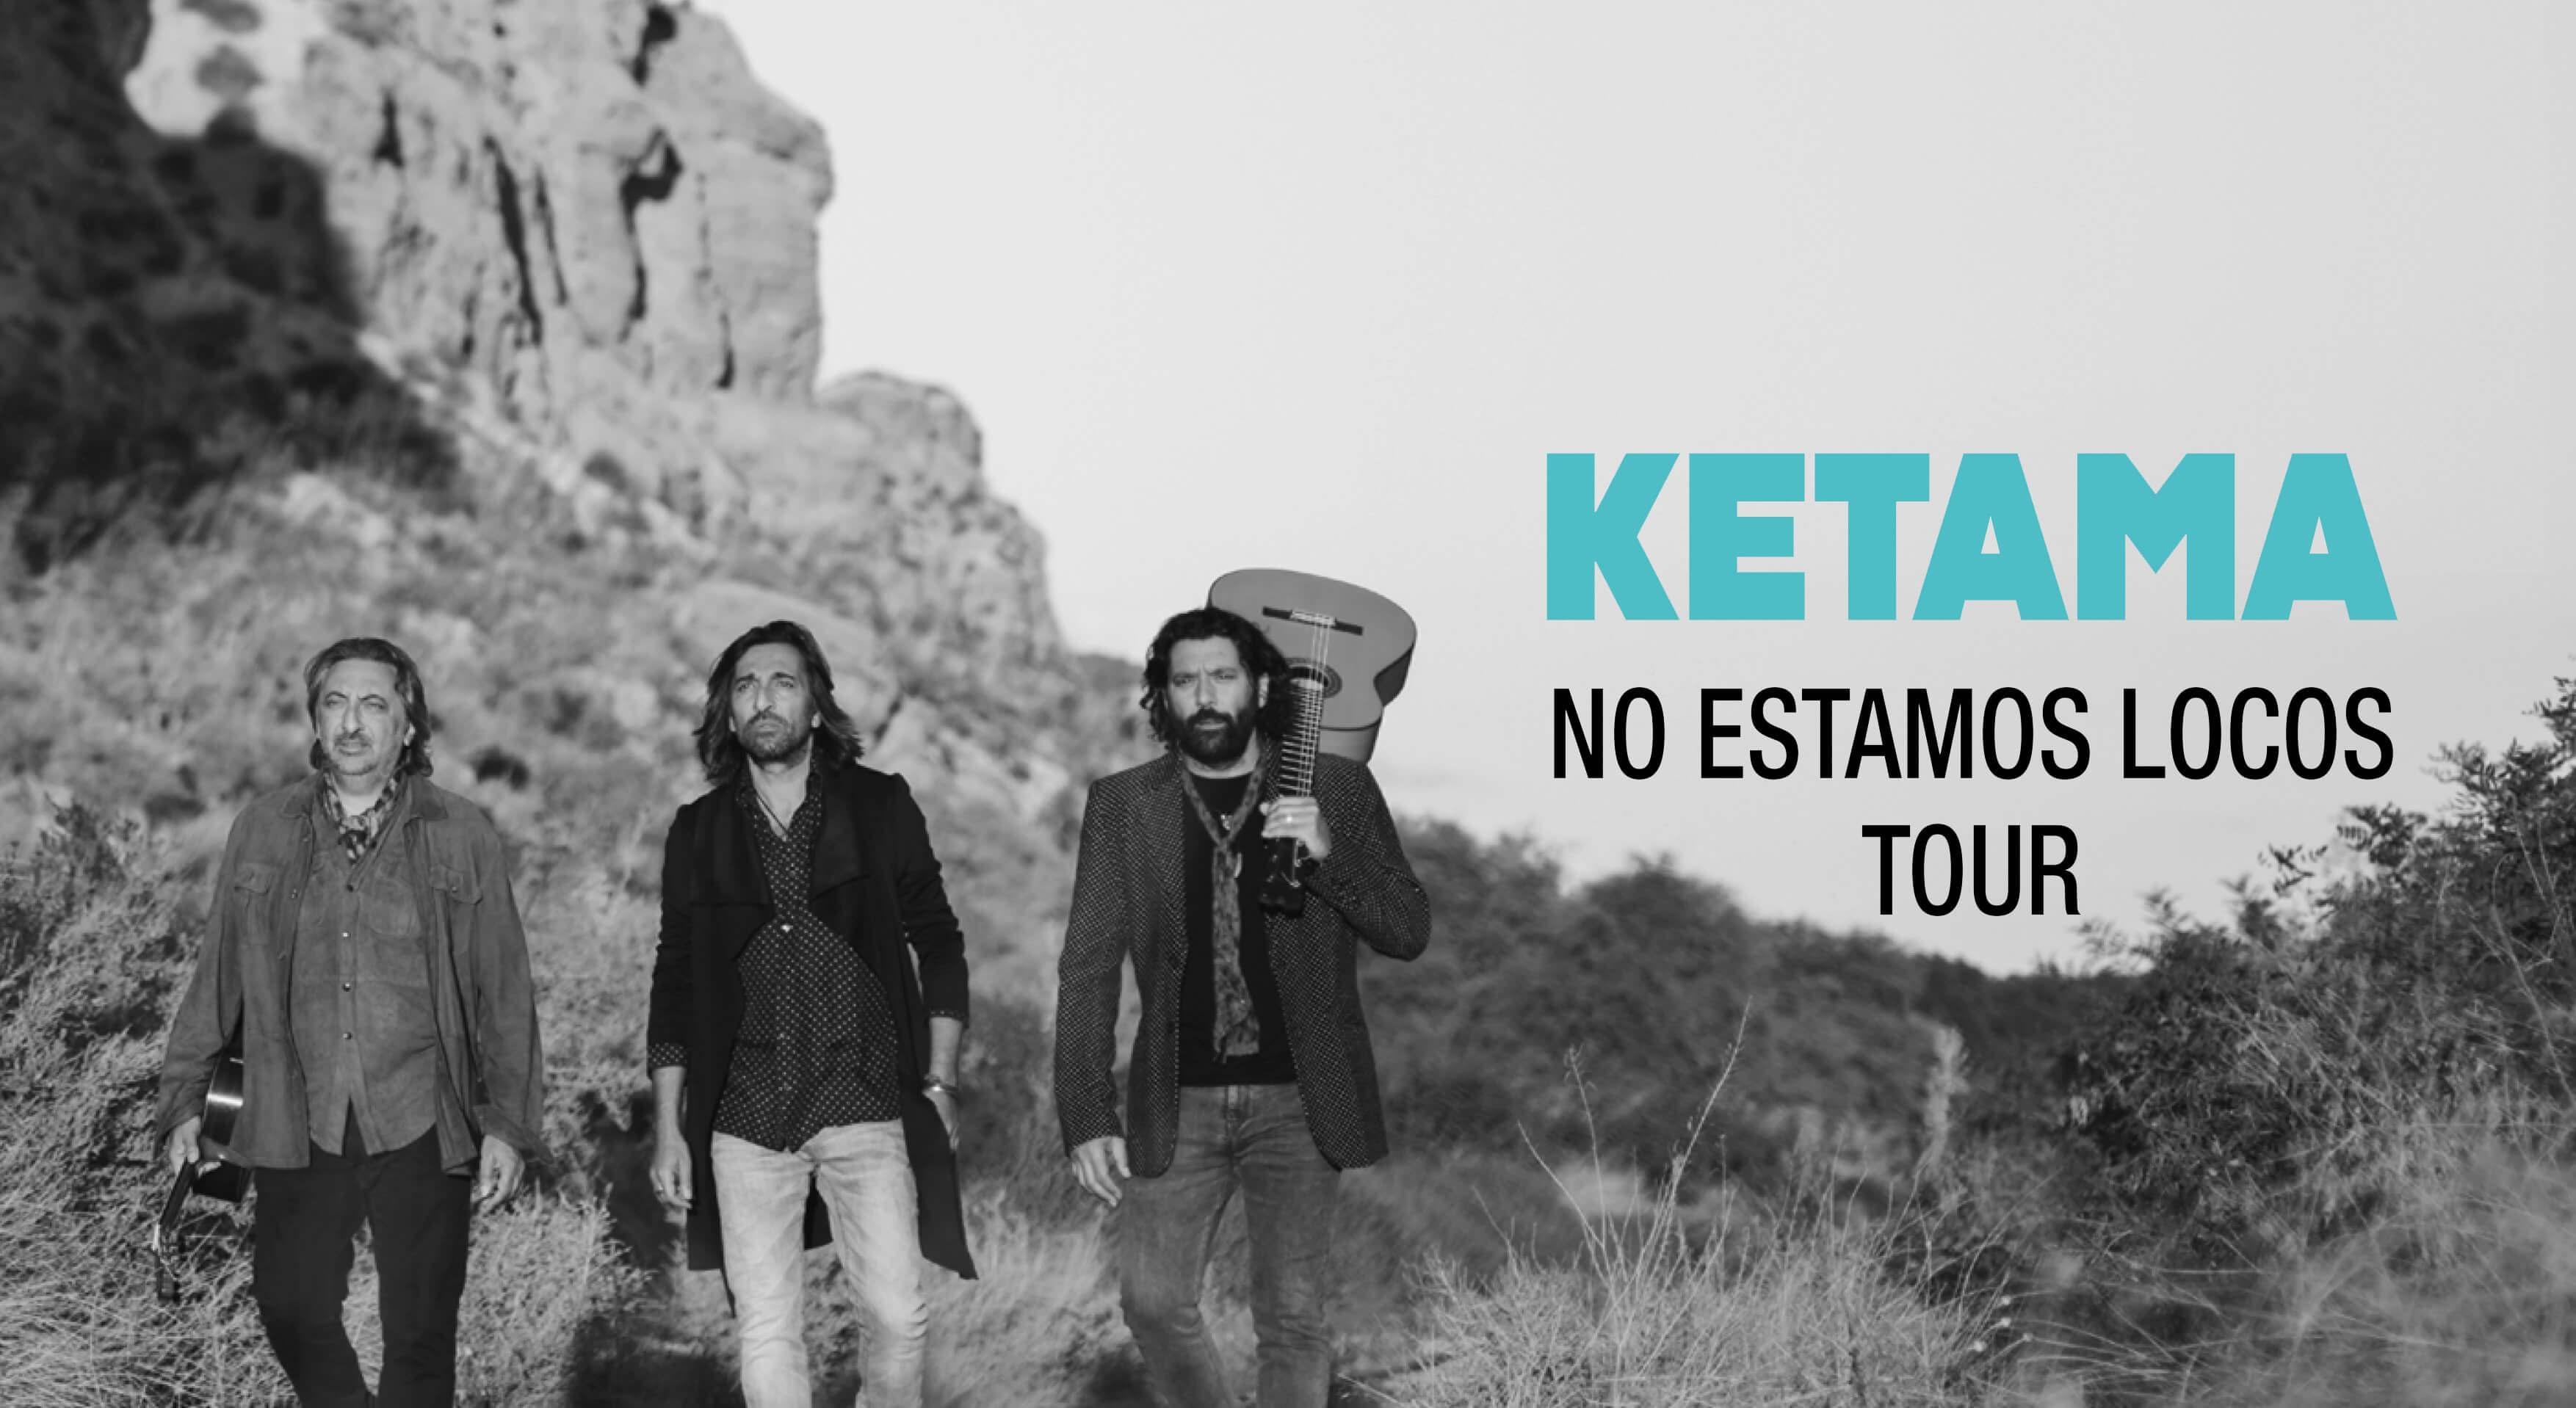 Ketama en el Festival Castillo de la Monclova